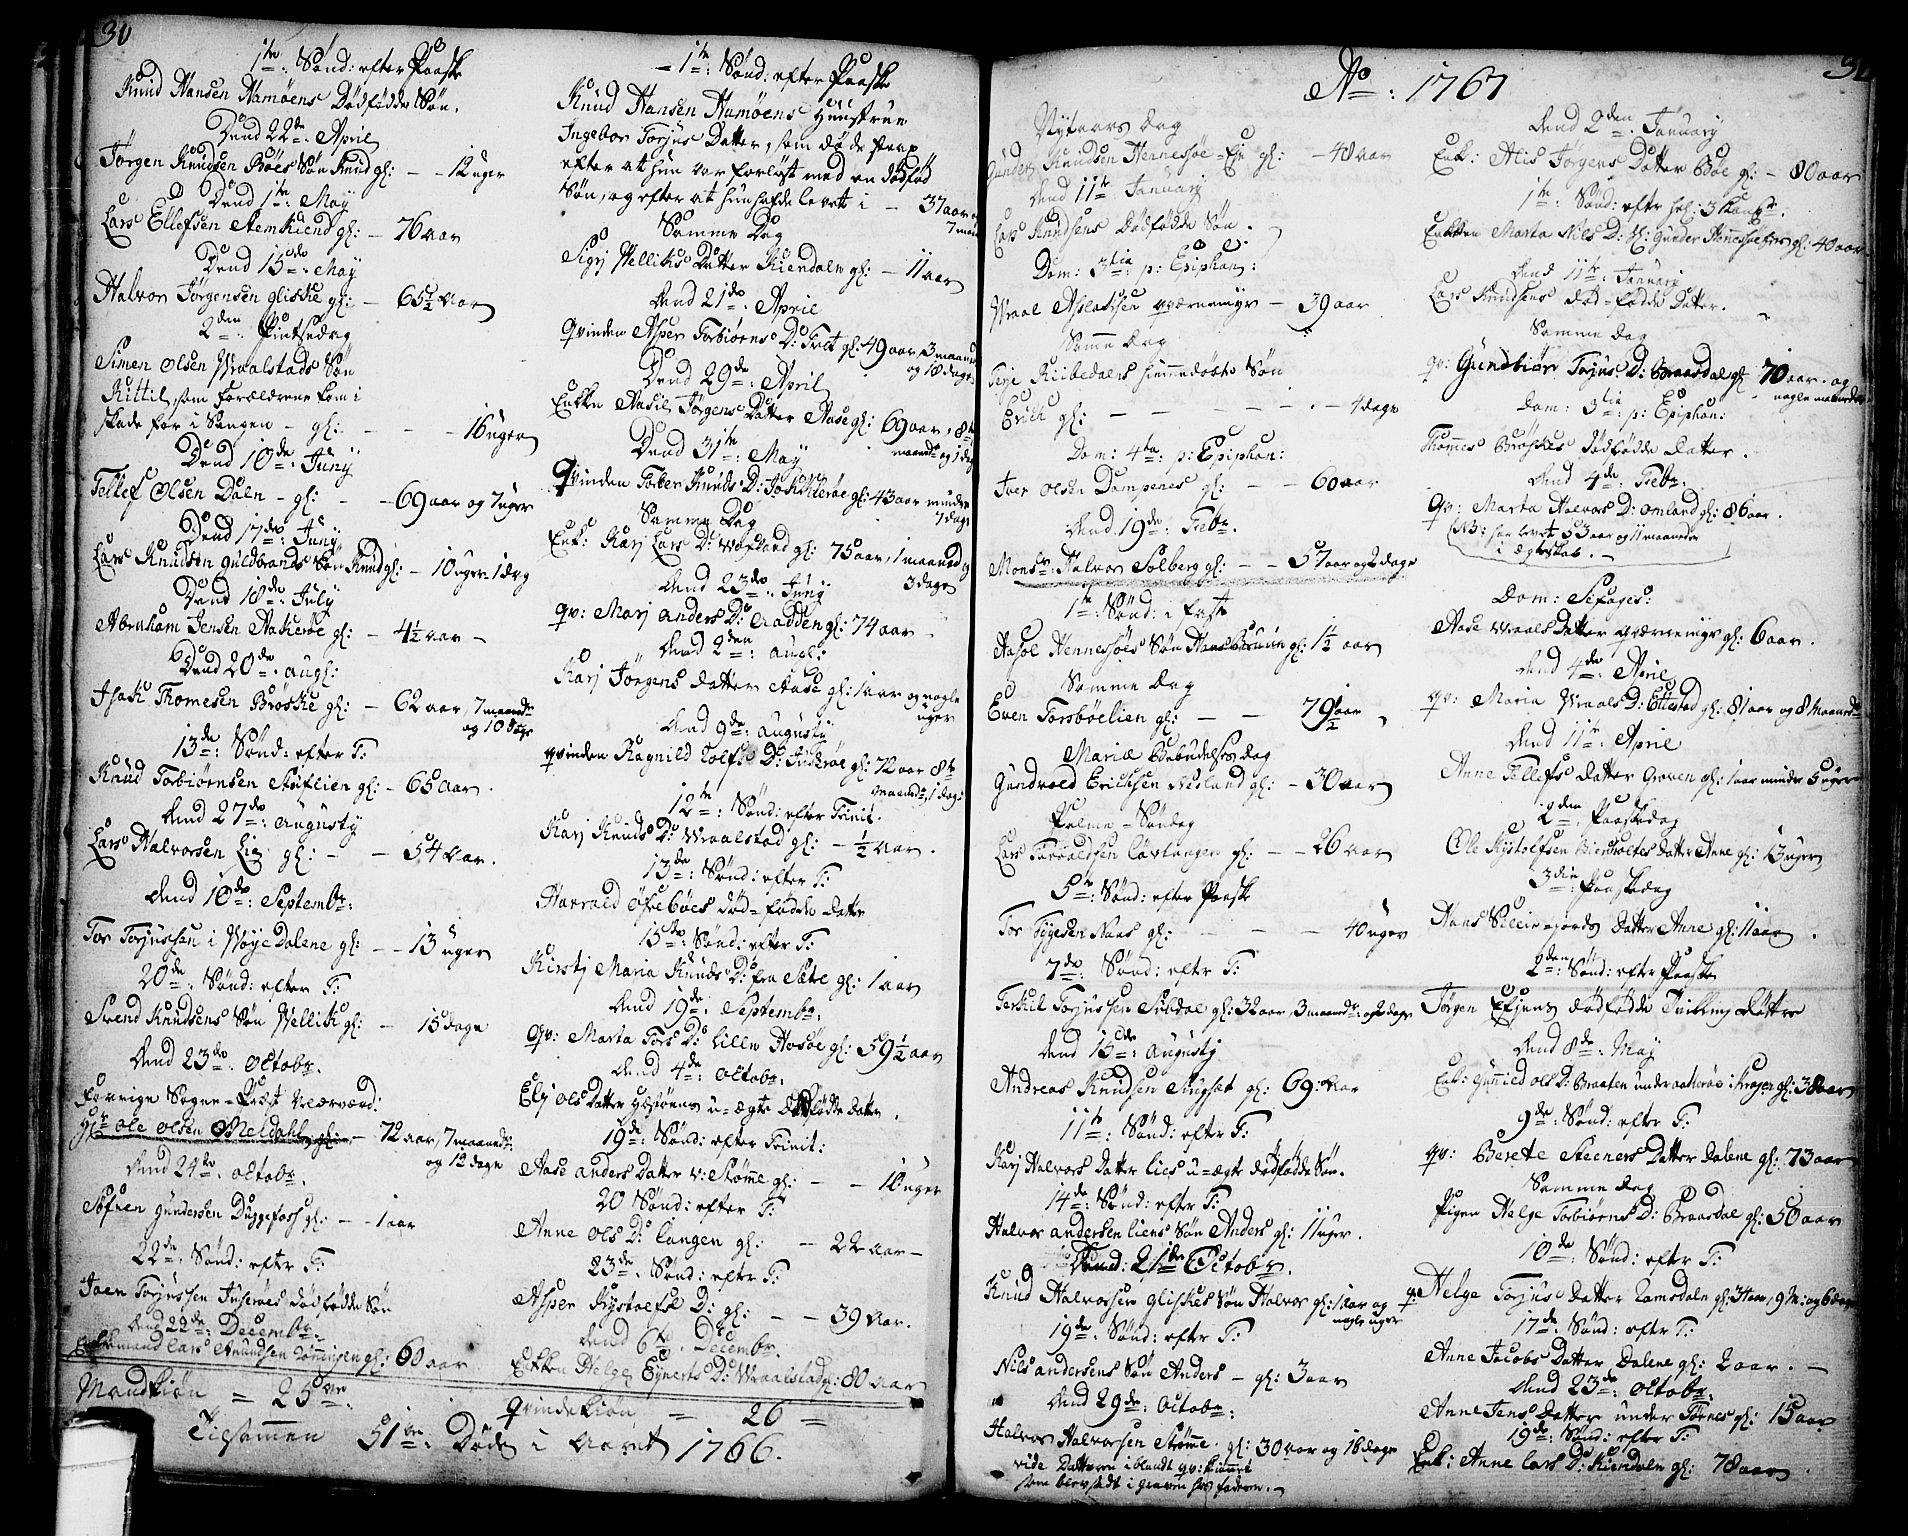 SAKO, Drangedal kirkebøker, F/Fa/L0001: Ministerialbok nr. 1, 1697-1767, s. 30-31